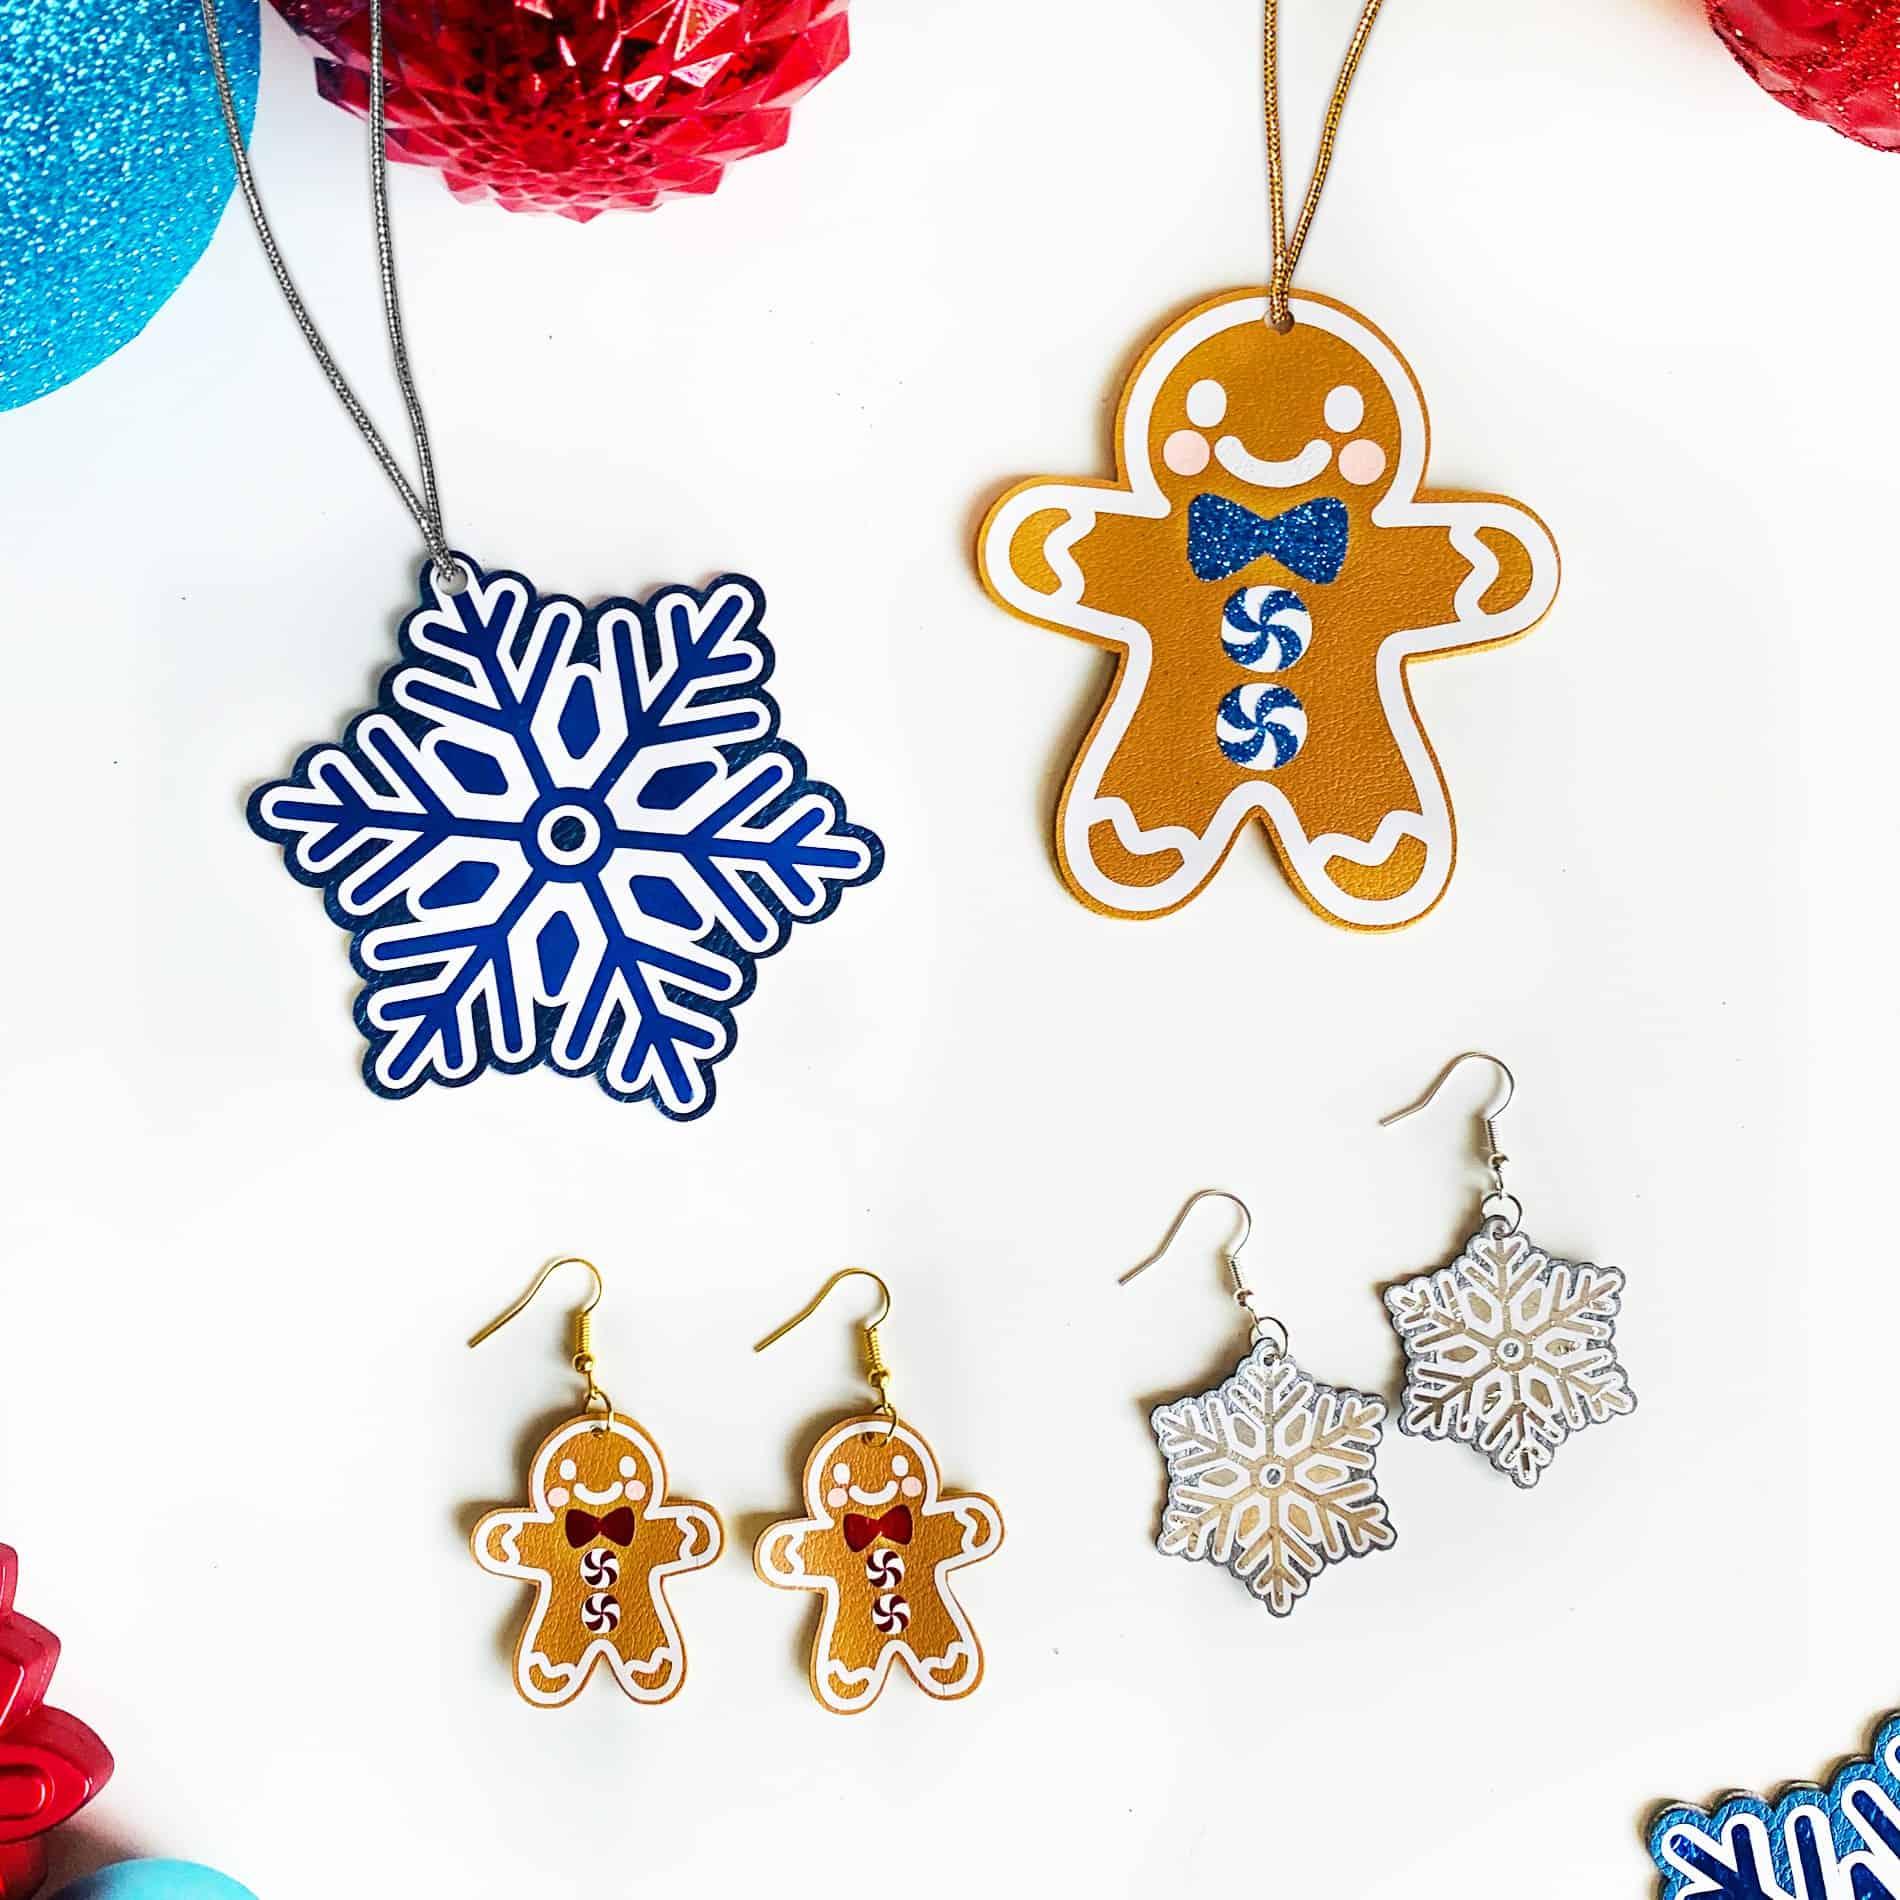 How to Make Festive Holiday Earrings with a Cricut